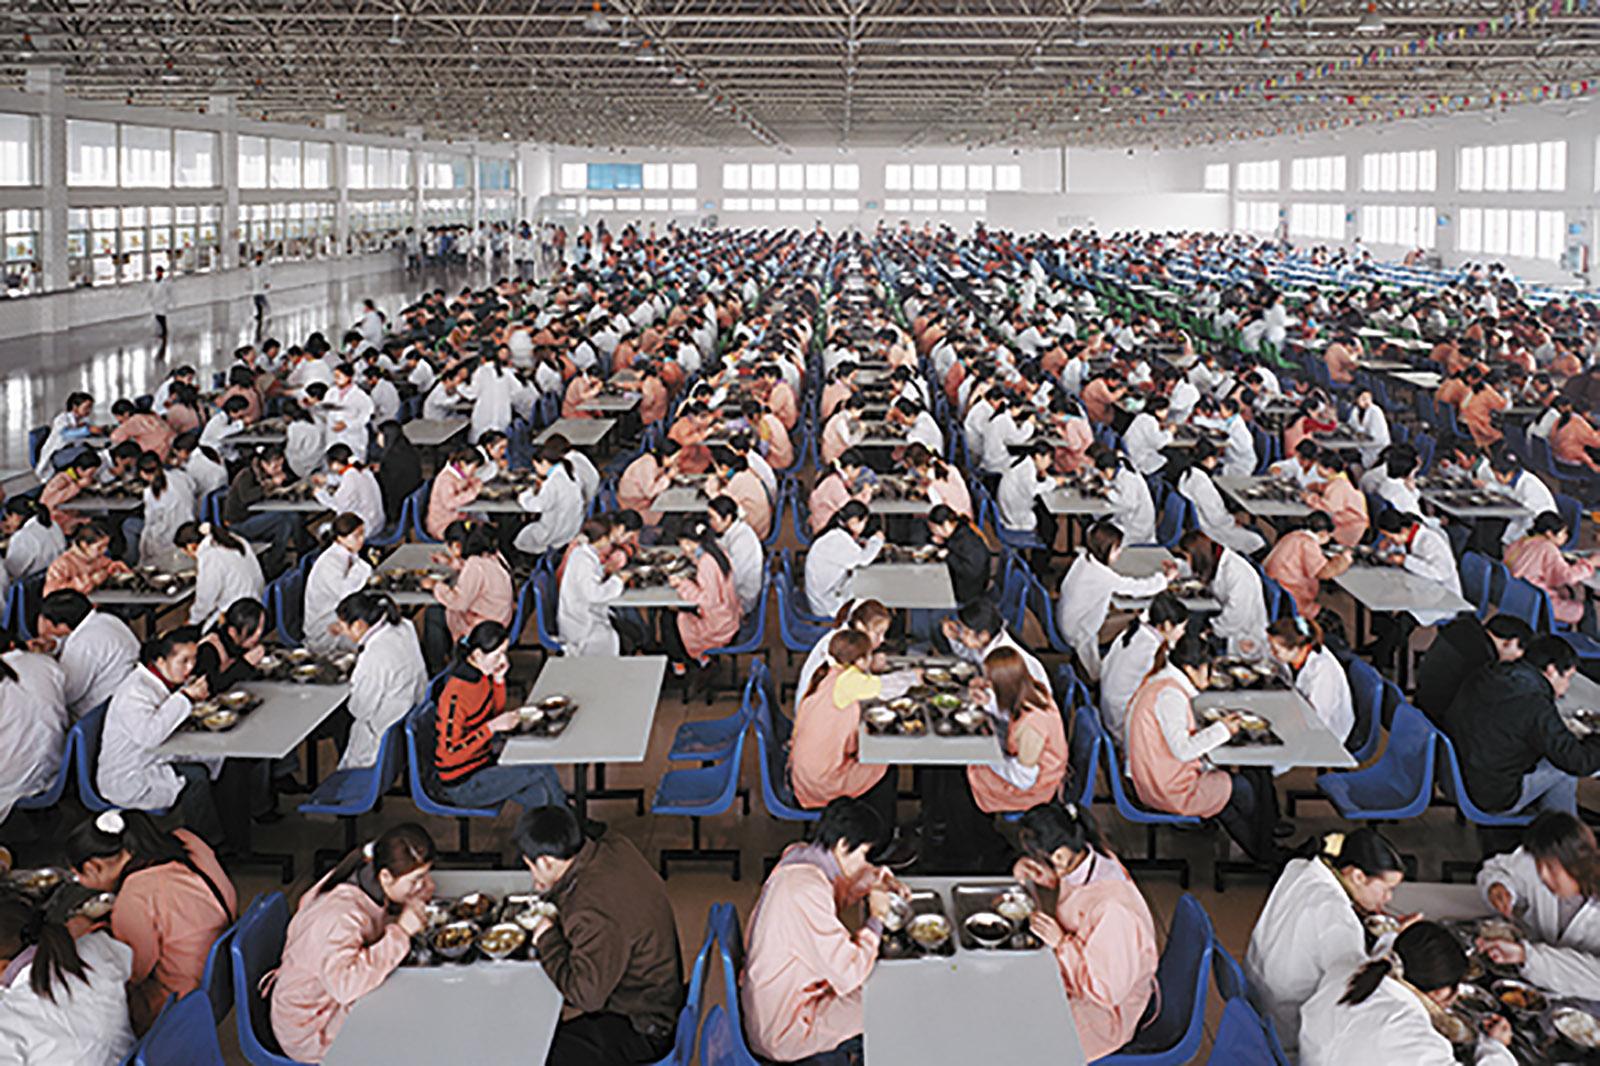 Edward Burtynsky: Manufacturing #11, Youngor Textiles, Ningbo, Zhejiang Province, China, 2005